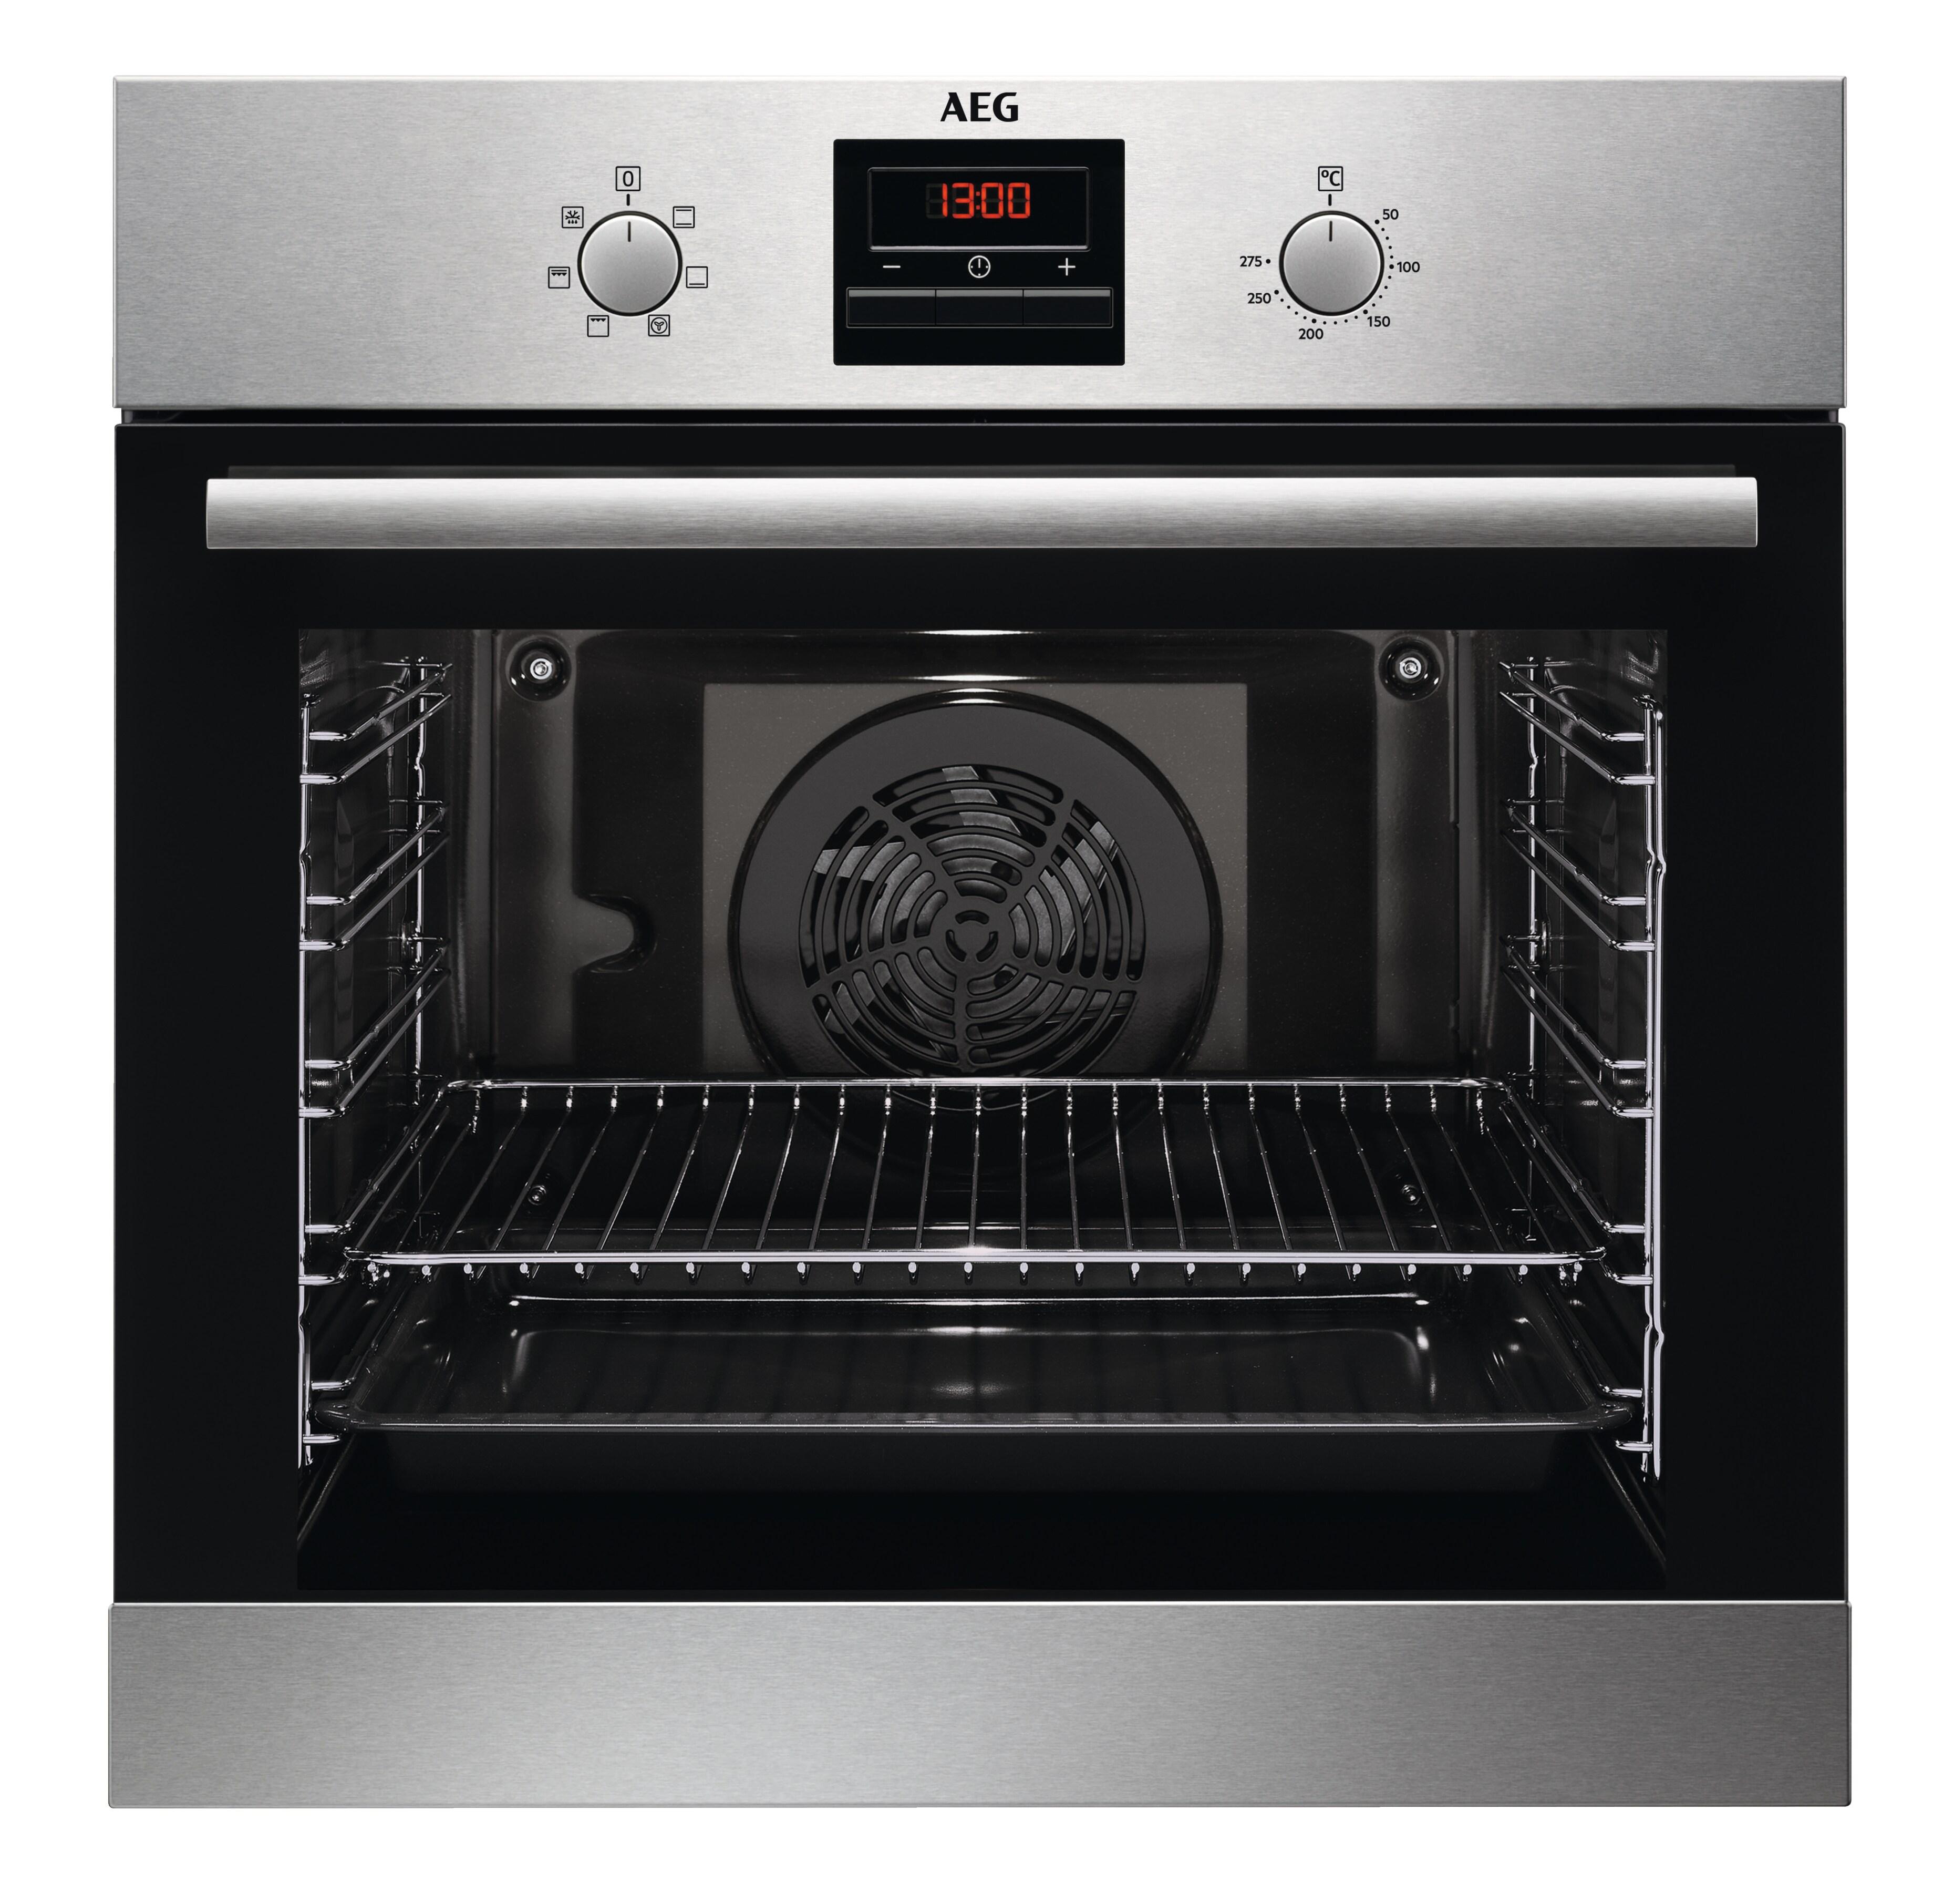 aeg bes33101zm einbauherd backofen stainless steel. Black Bedroom Furniture Sets. Home Design Ideas